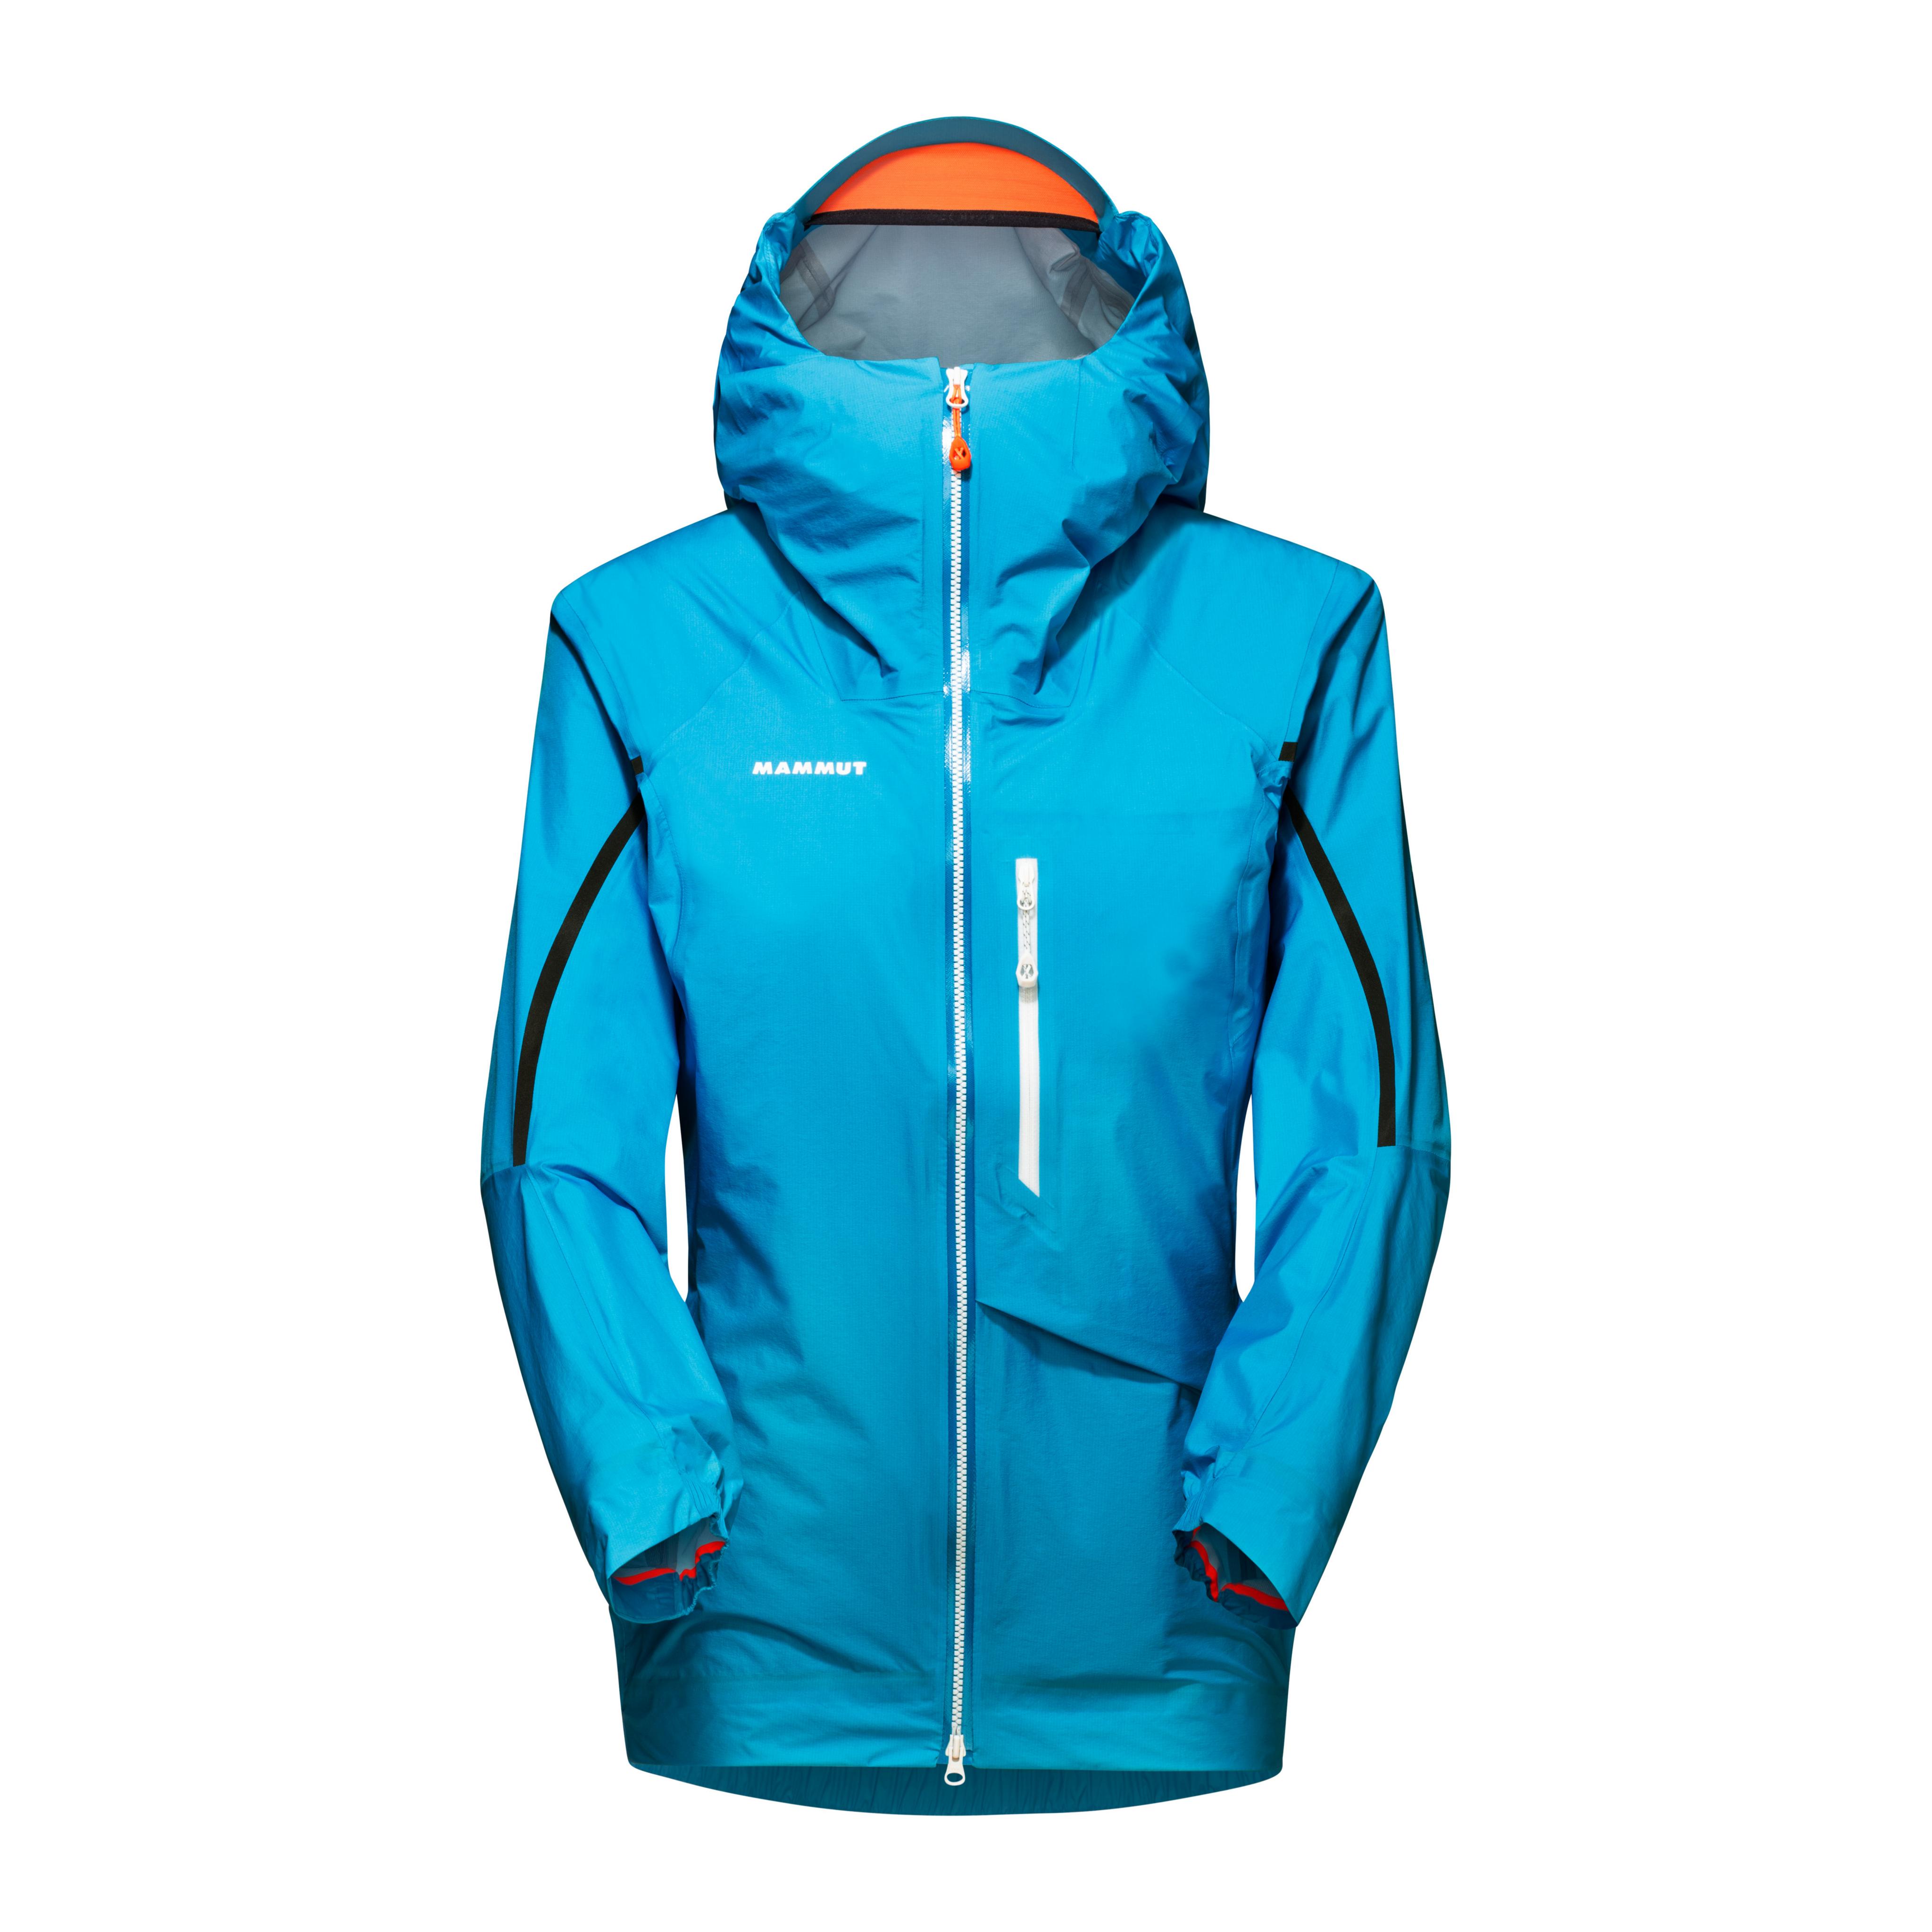 Nordwand Light HS Hooded Jacket Women - sky, XS thumbnail